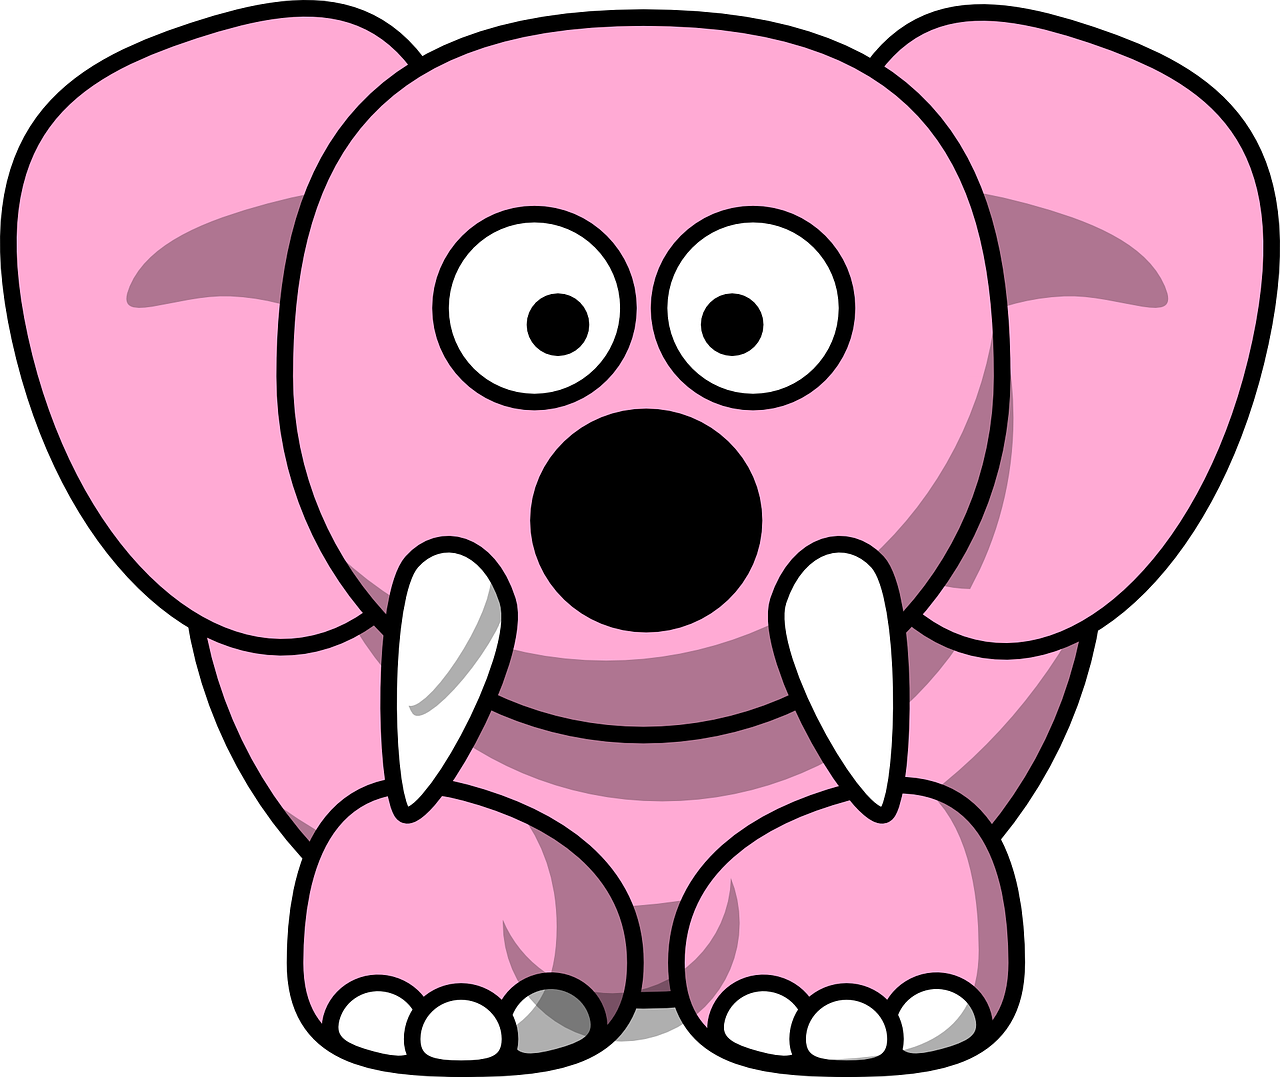 elephant-304820_1280.png